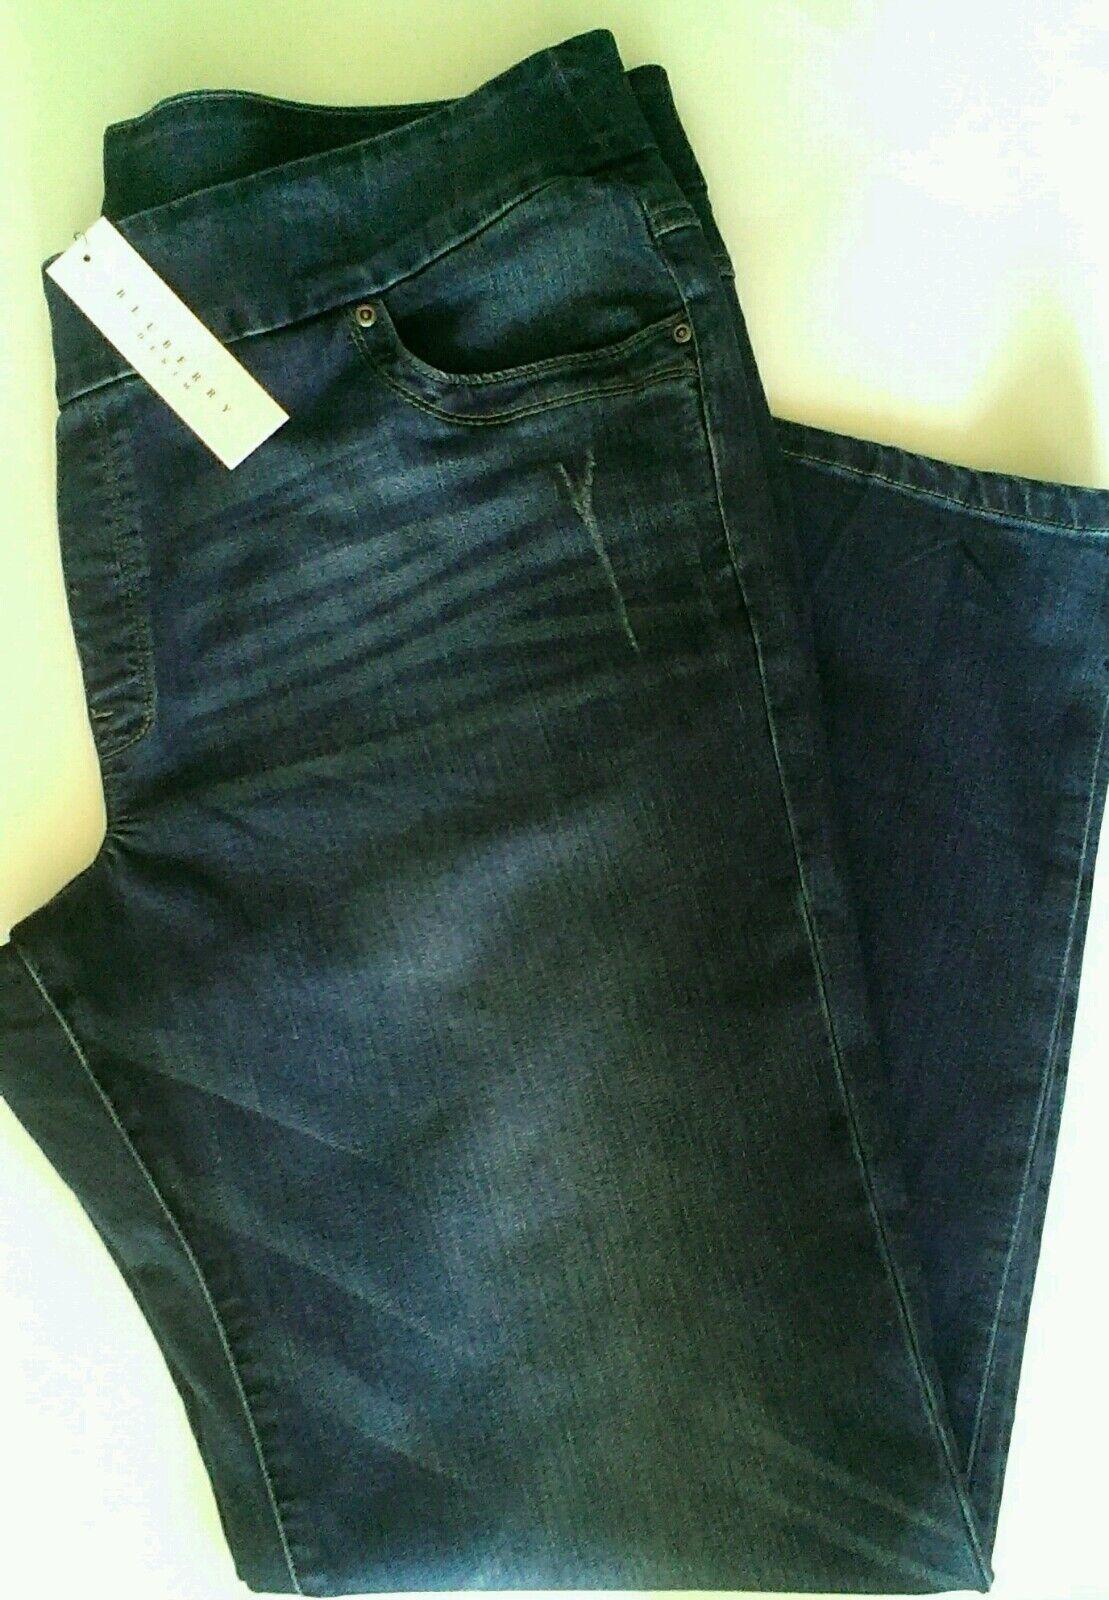 blueeberry Denim Comfort Fit Stretch Distressed Premium Jessie Slim Leg NEW 20W